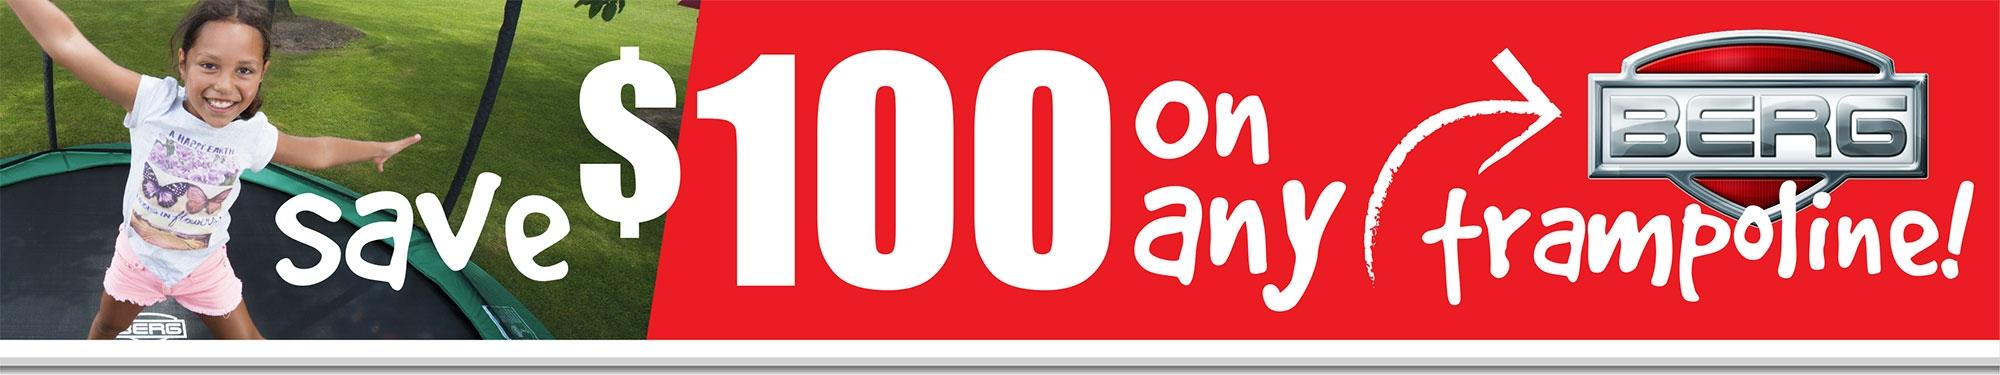 BERG Trampolines Save $100